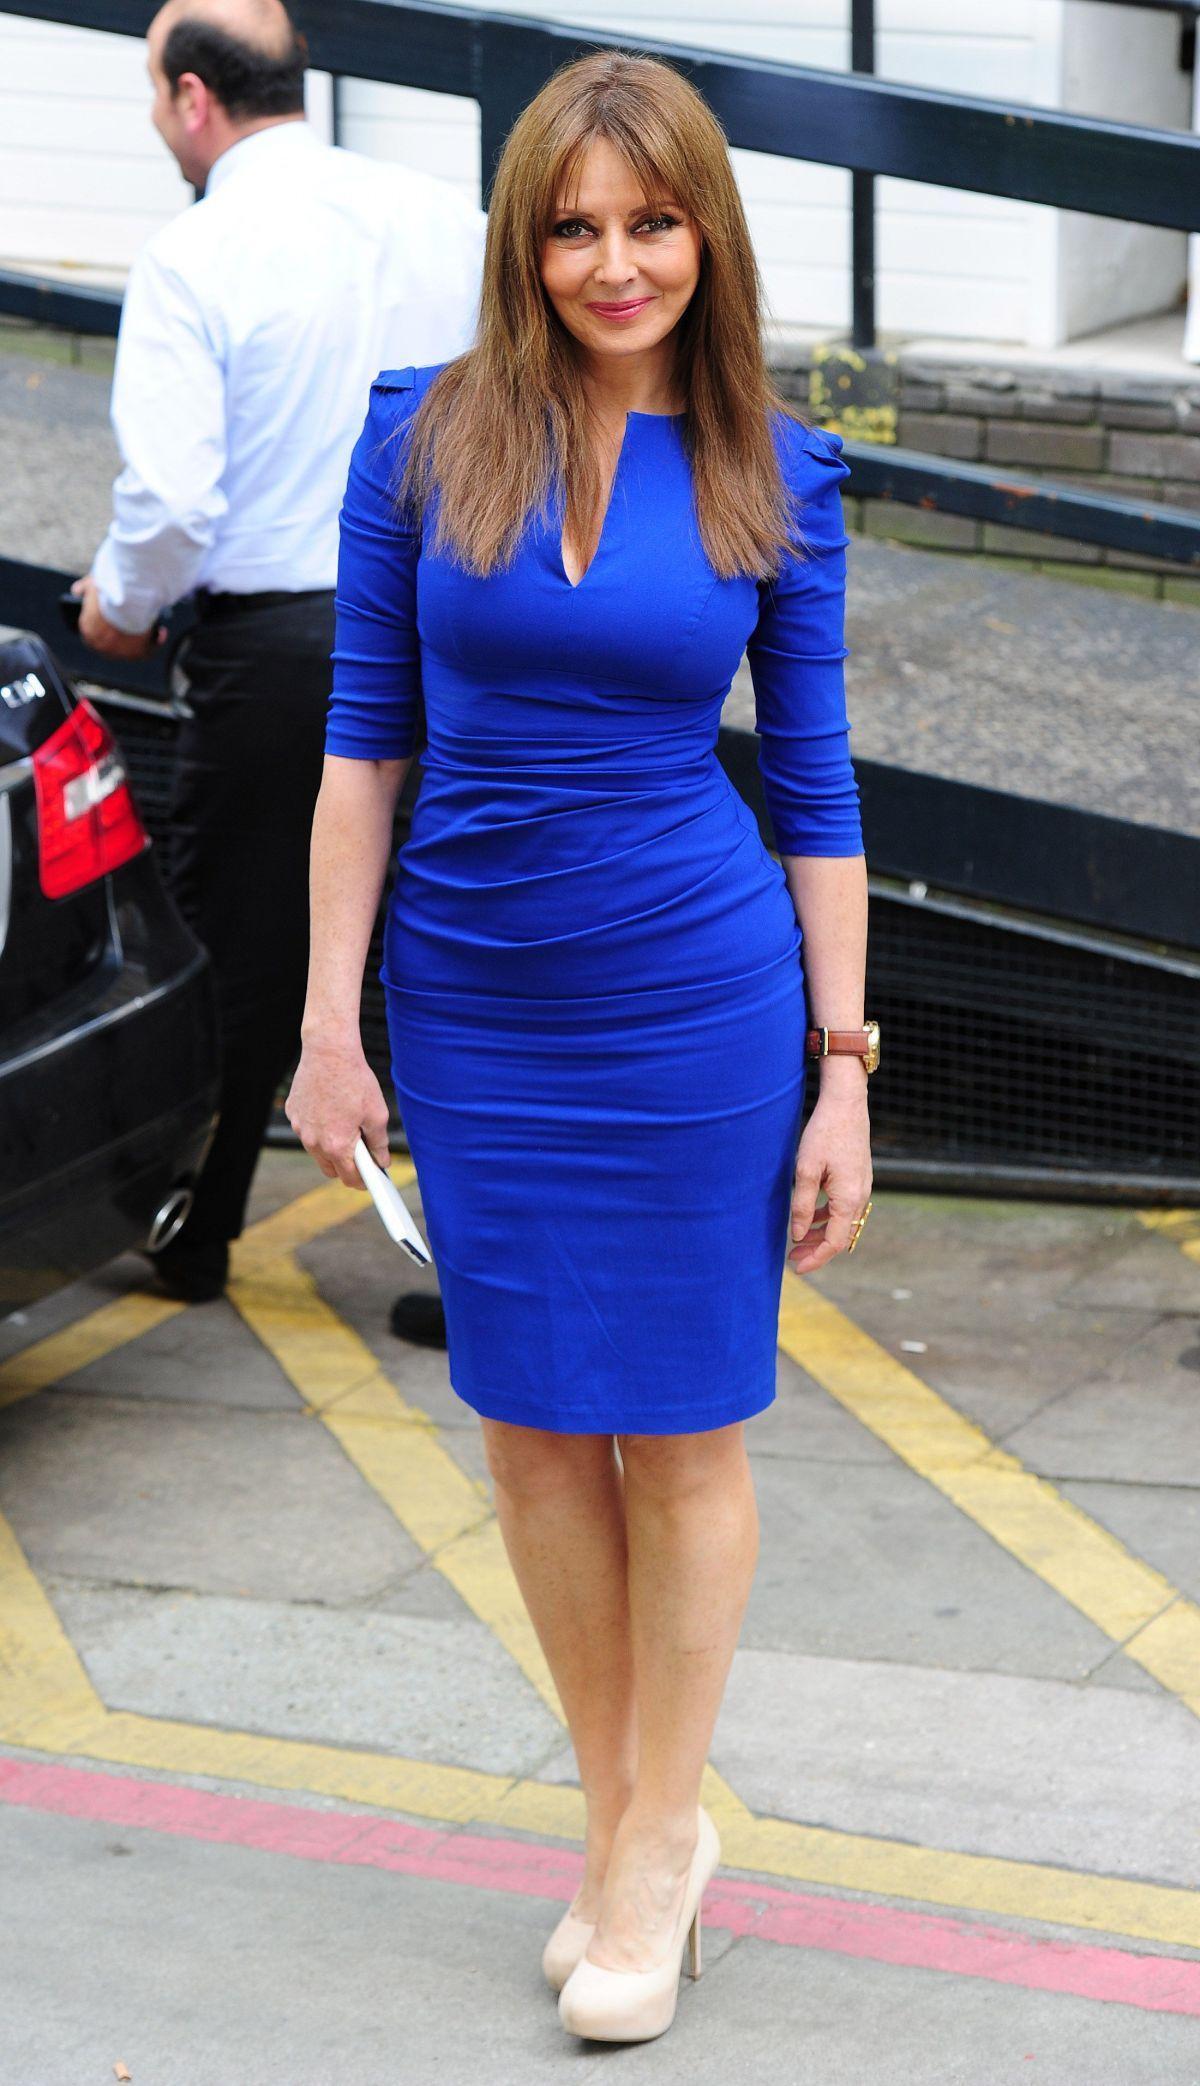 Carol vorderman that blue dress